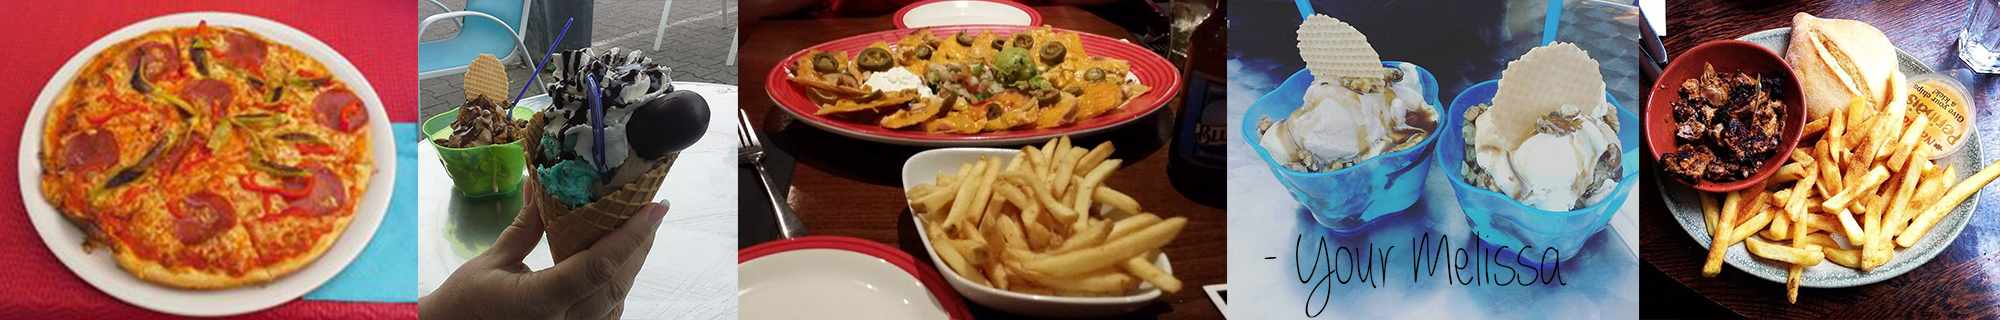 food_pics_eng